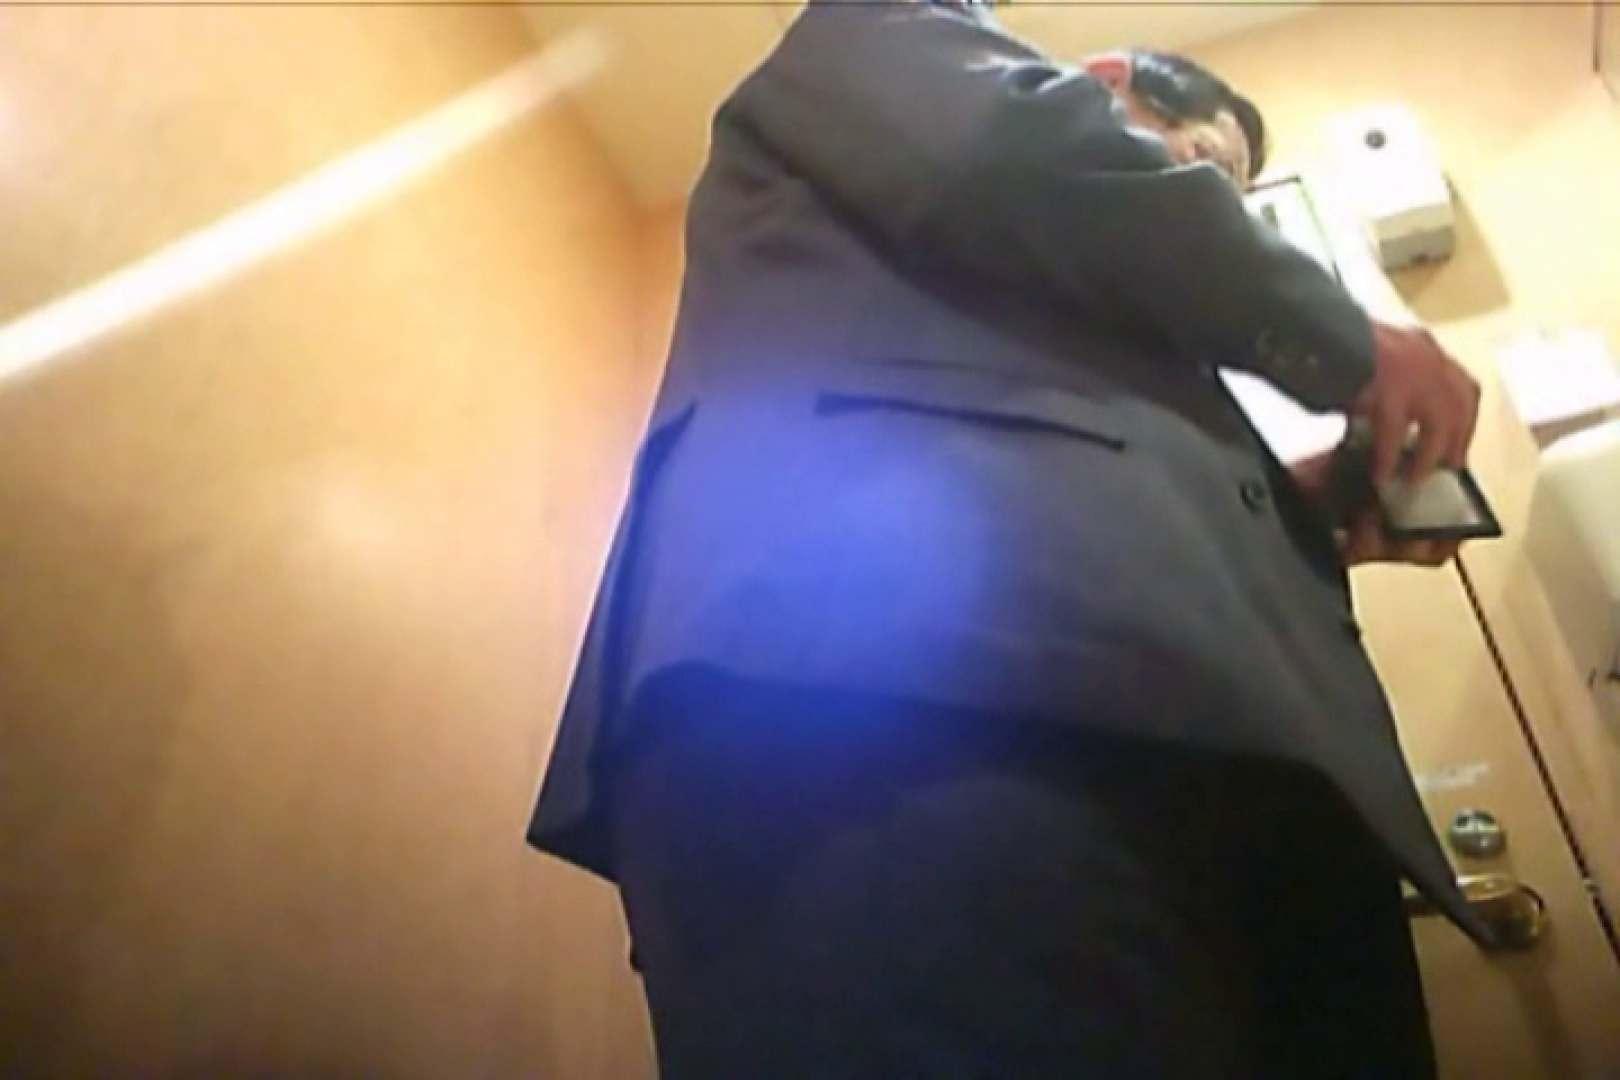 SEASON 2ND!掴み取りさんの洗面所覗き!in新幹線!VOL.01 ボーイズ覗き | リーマン系ボーイズ  106pic 28